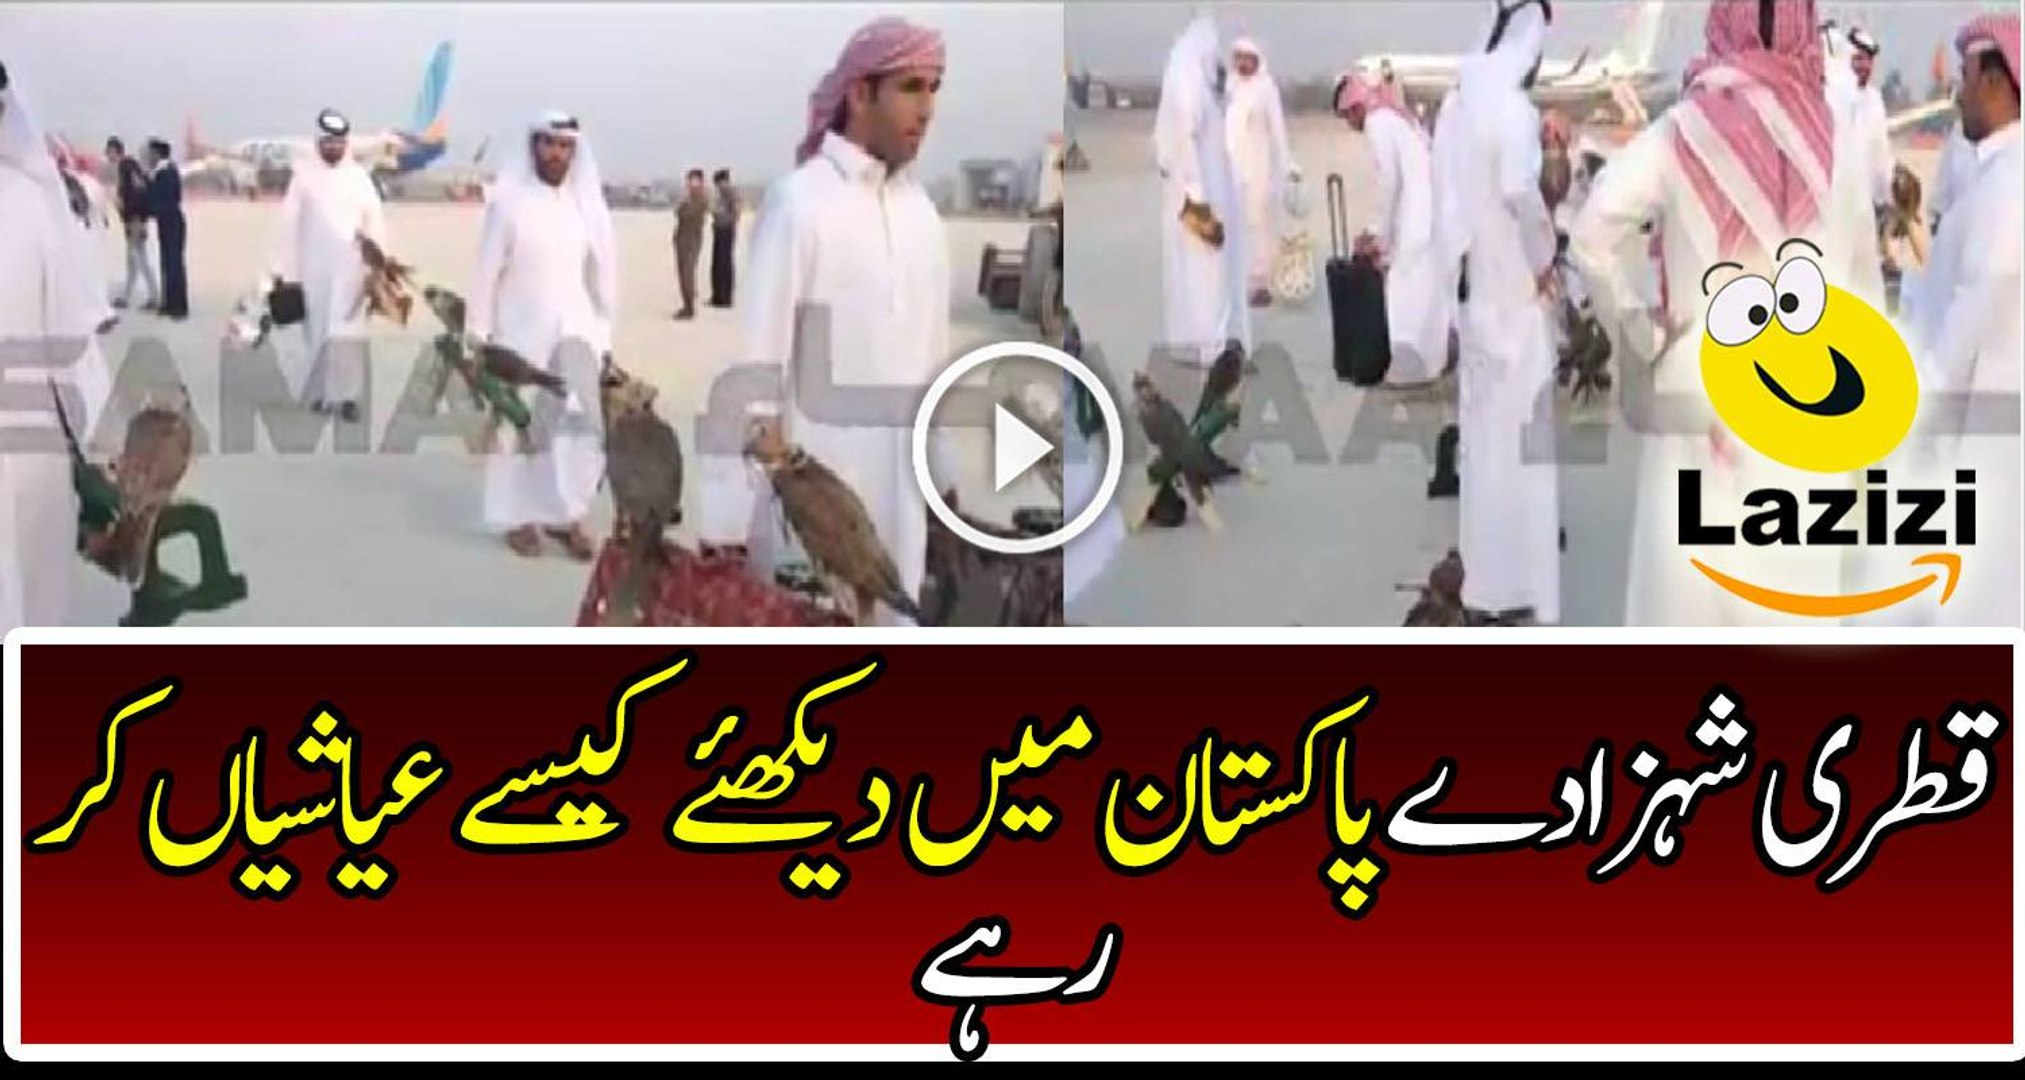 Qatar Royal Family is Enjoying in Pakistan